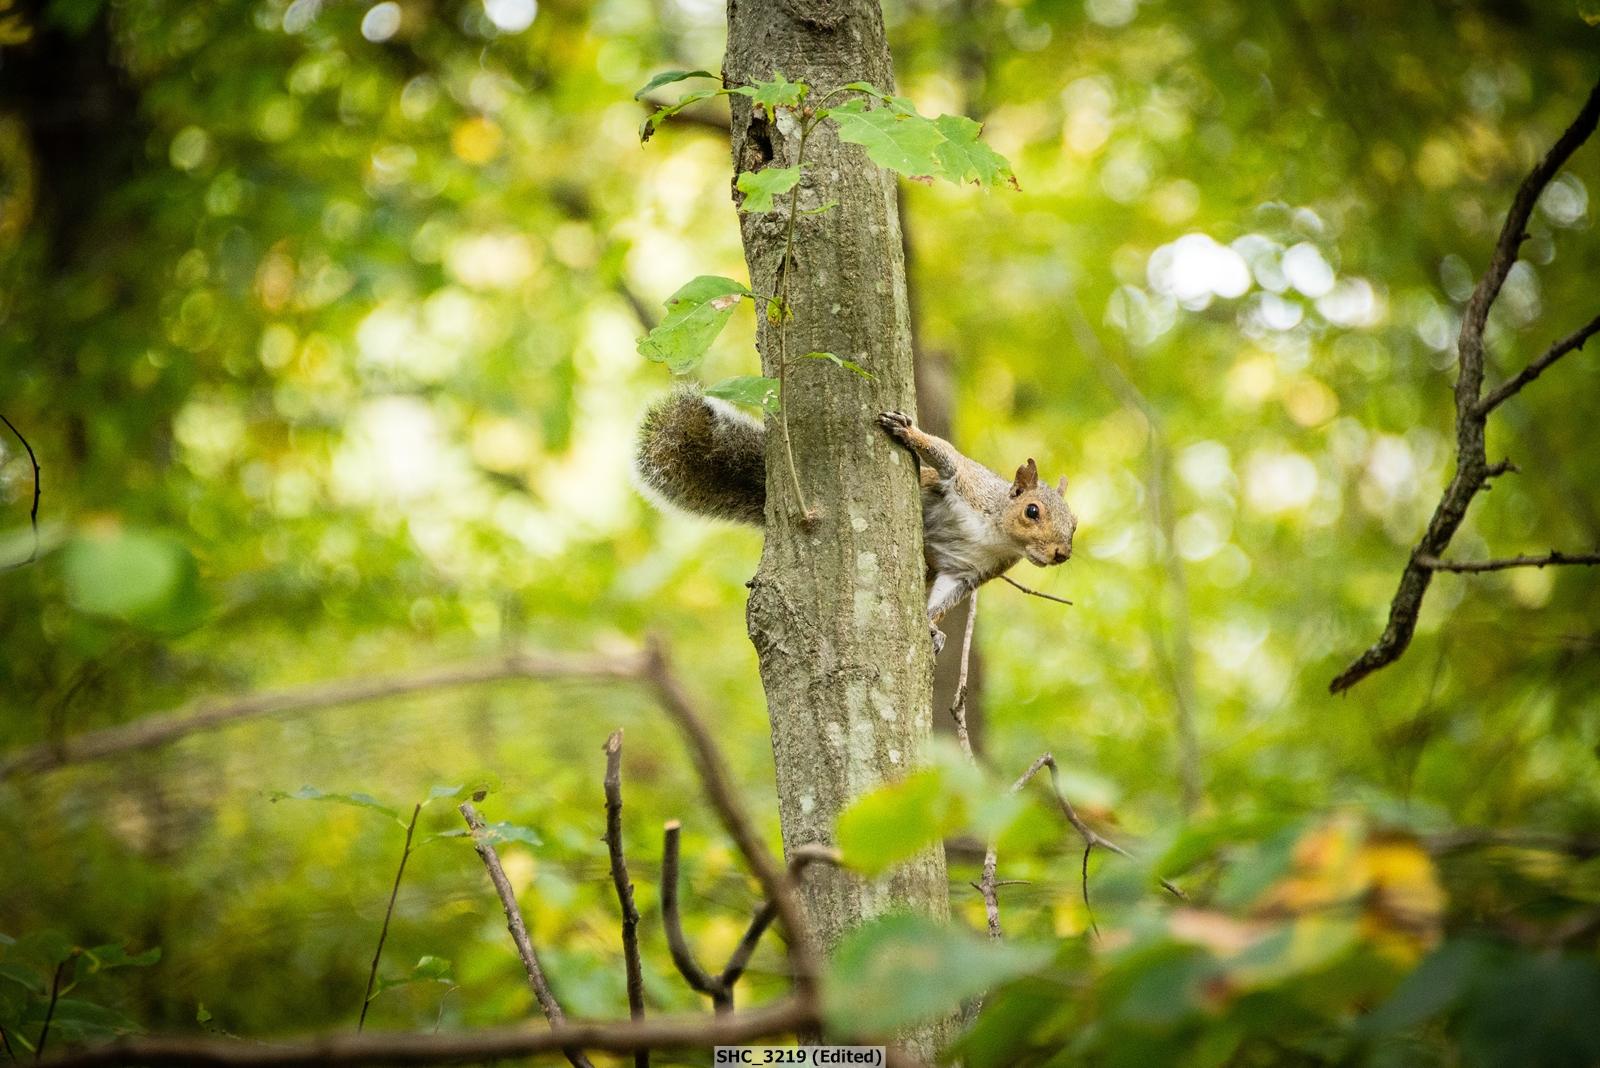 Squirrel-002.jpg